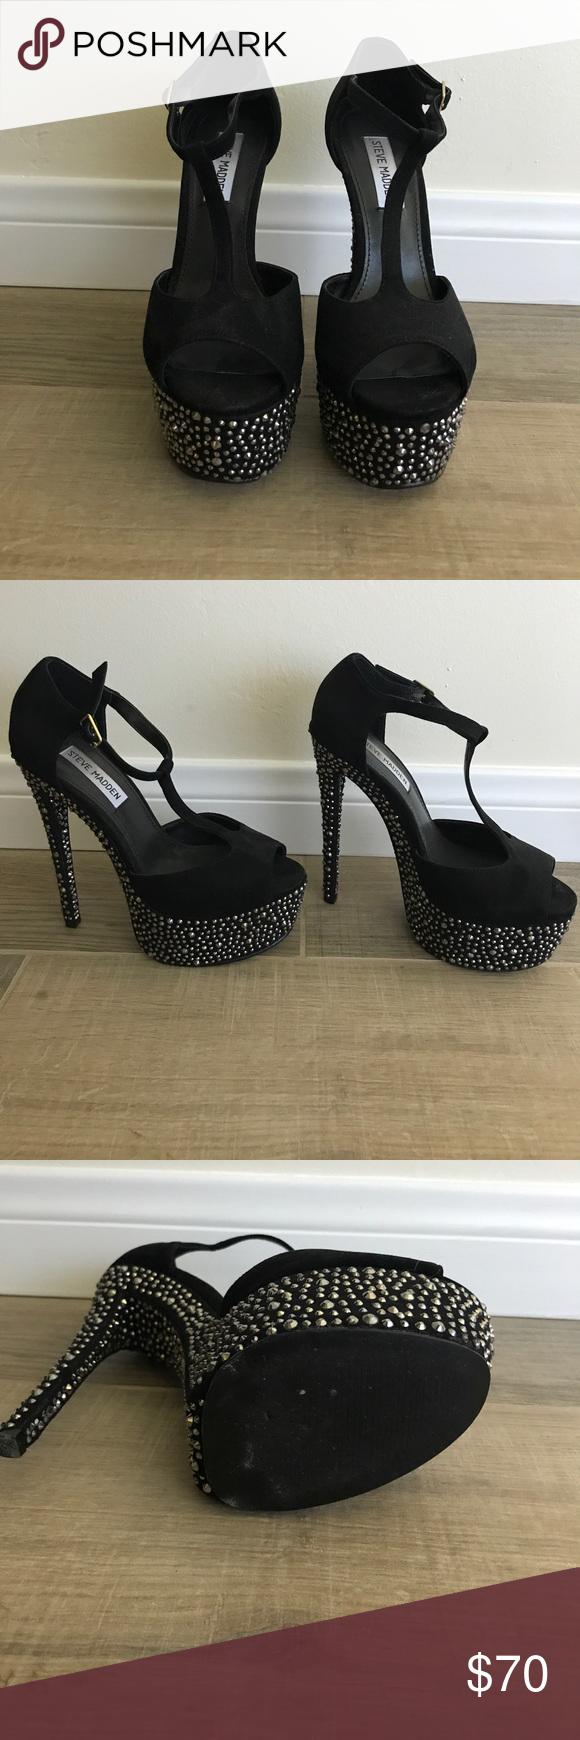 Steve Madden black rhinestone heels